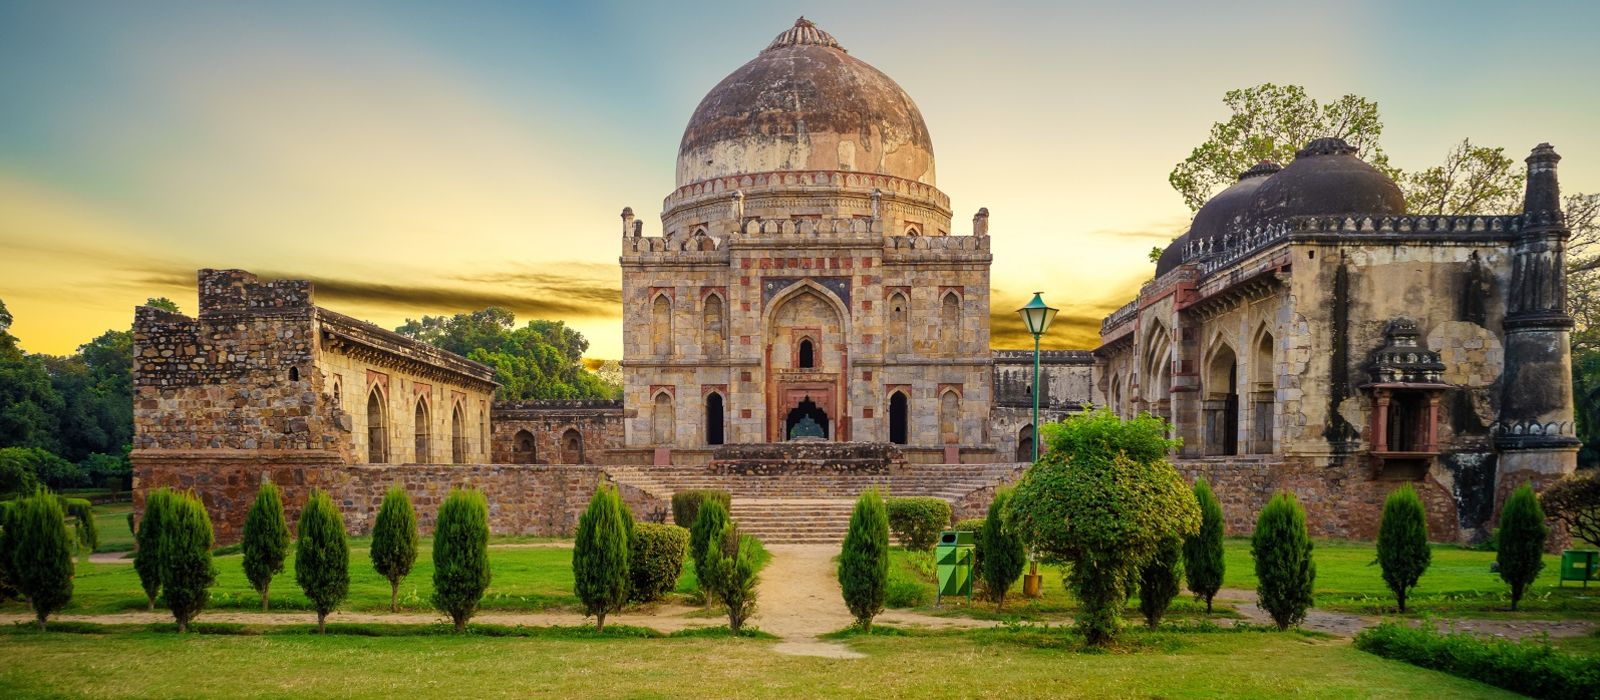 Oberoi Exclusive: Rajasthan's Heritage Cities and Safari Tour Trip 4